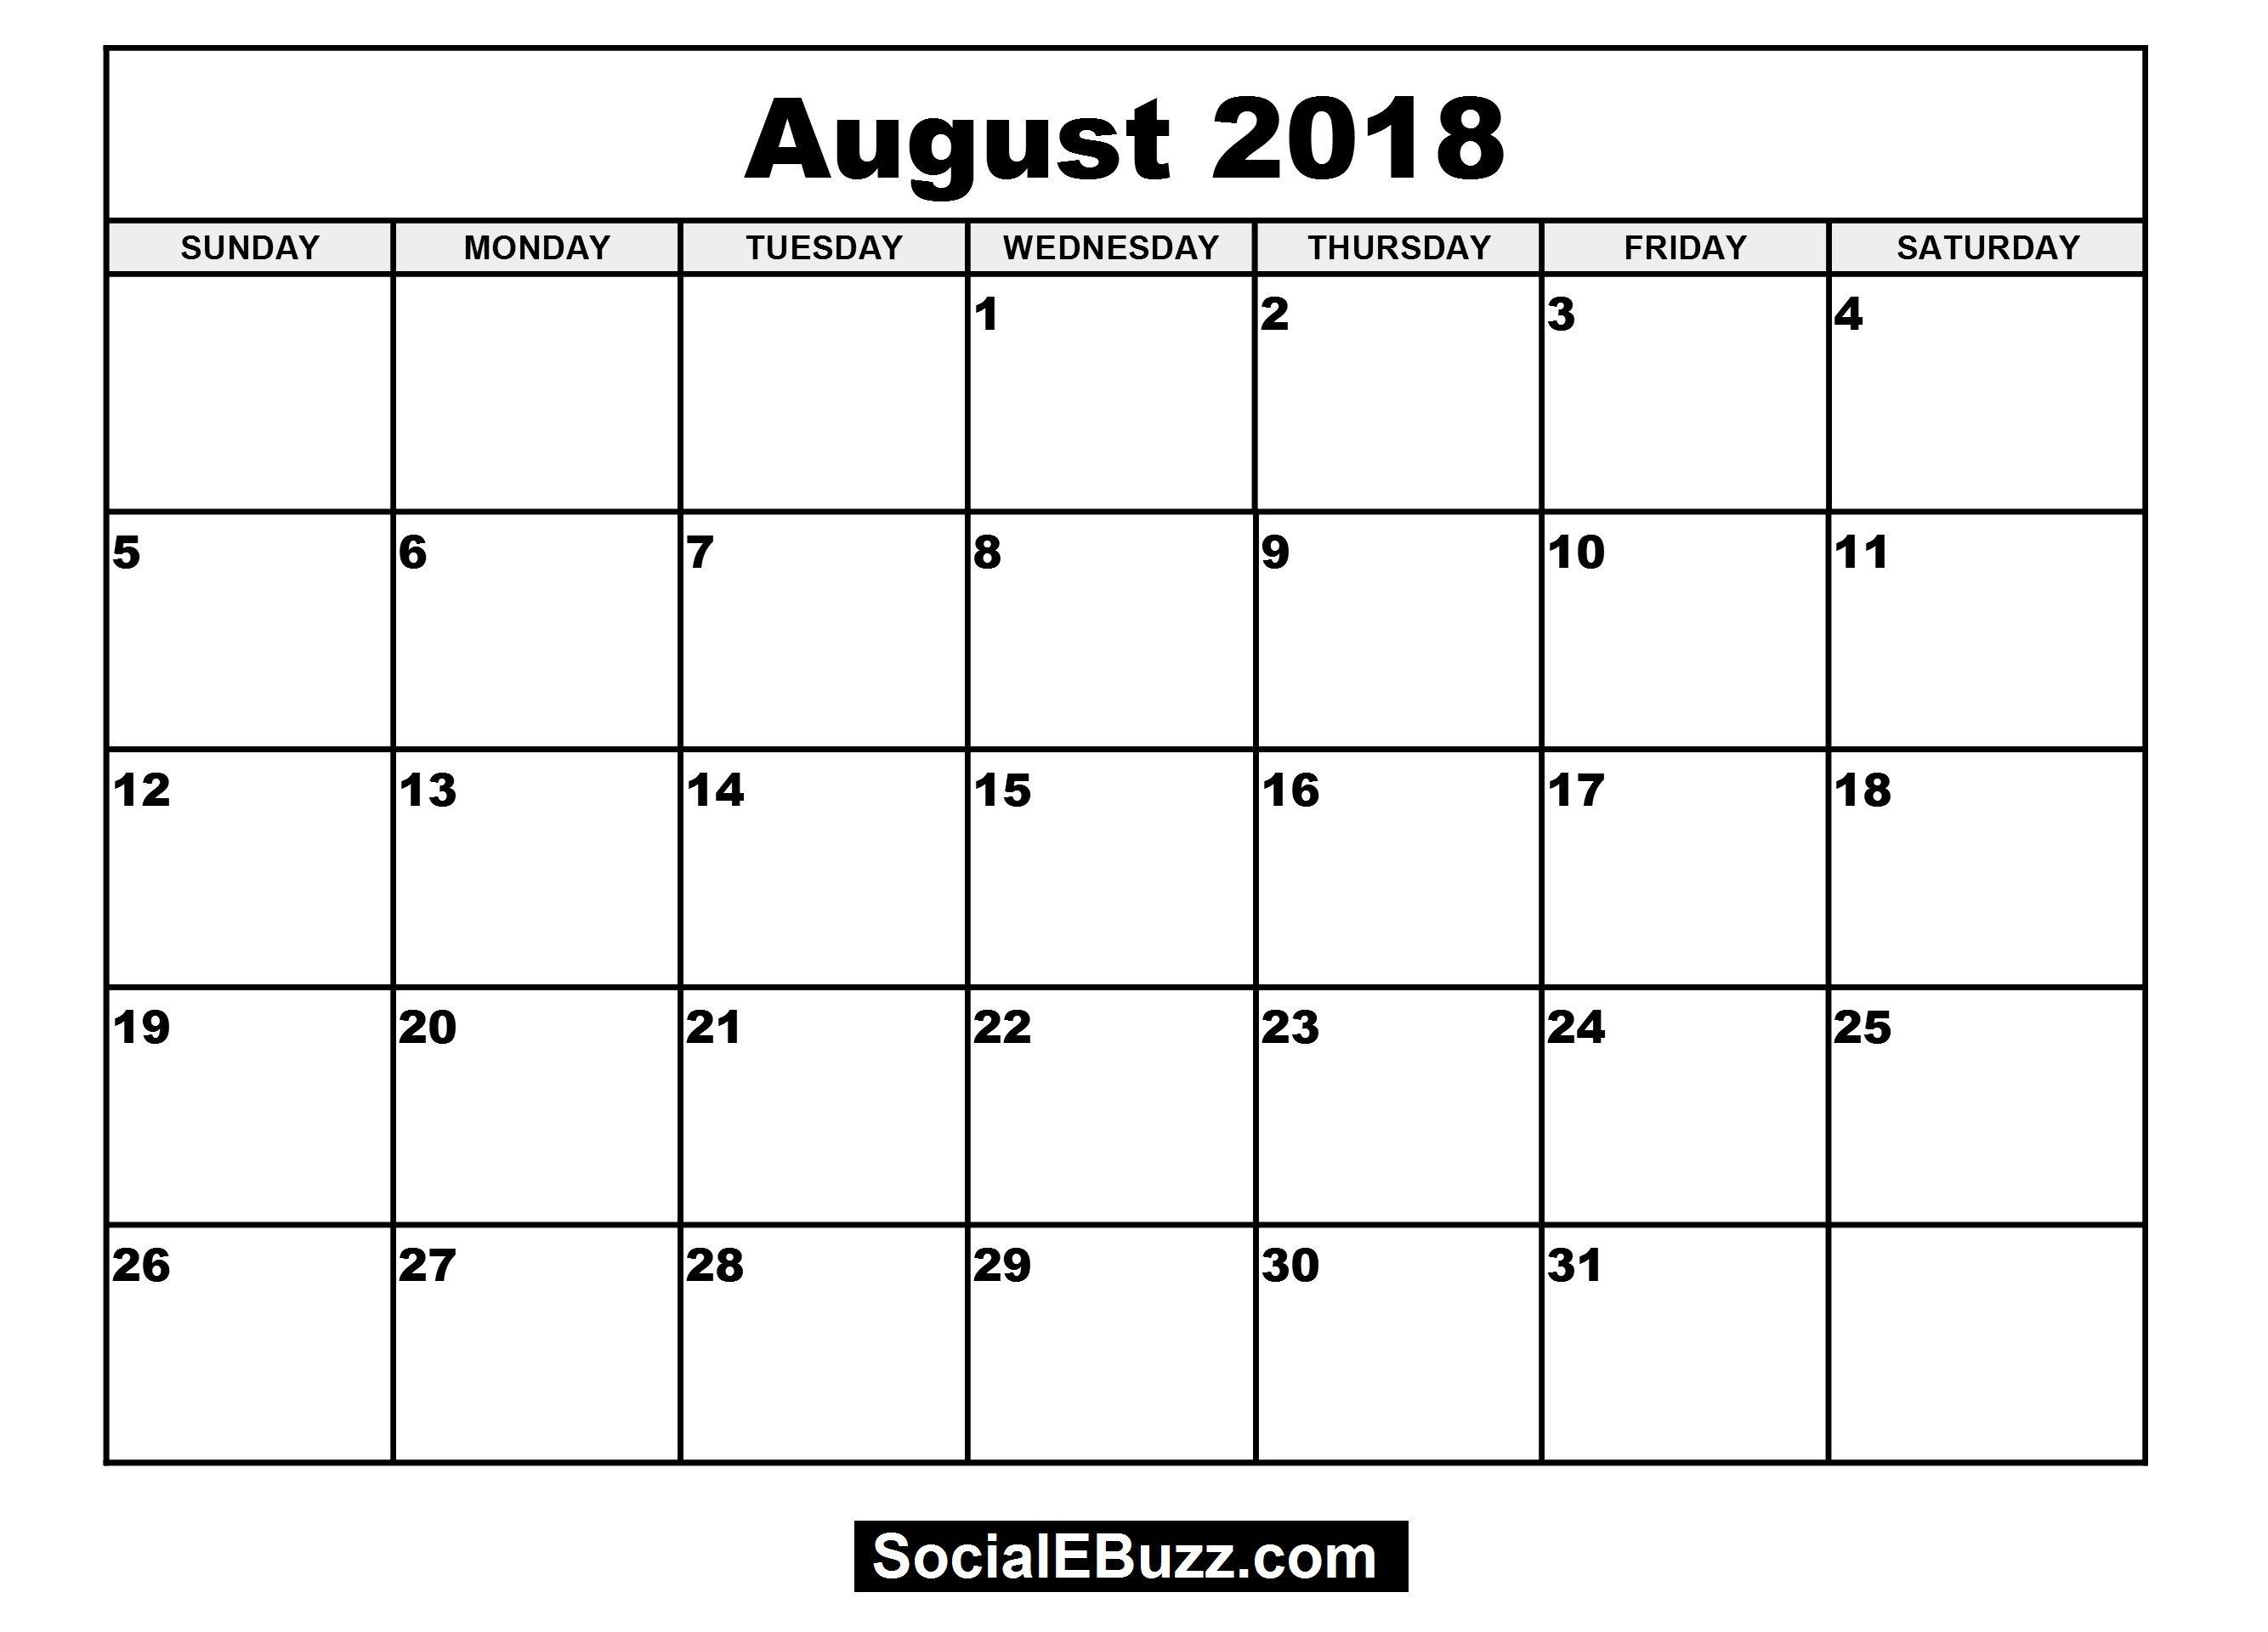 Pincalendar Printable On August 2018 Calendar | 2018 Calendar inside Blank Calendar Template For August